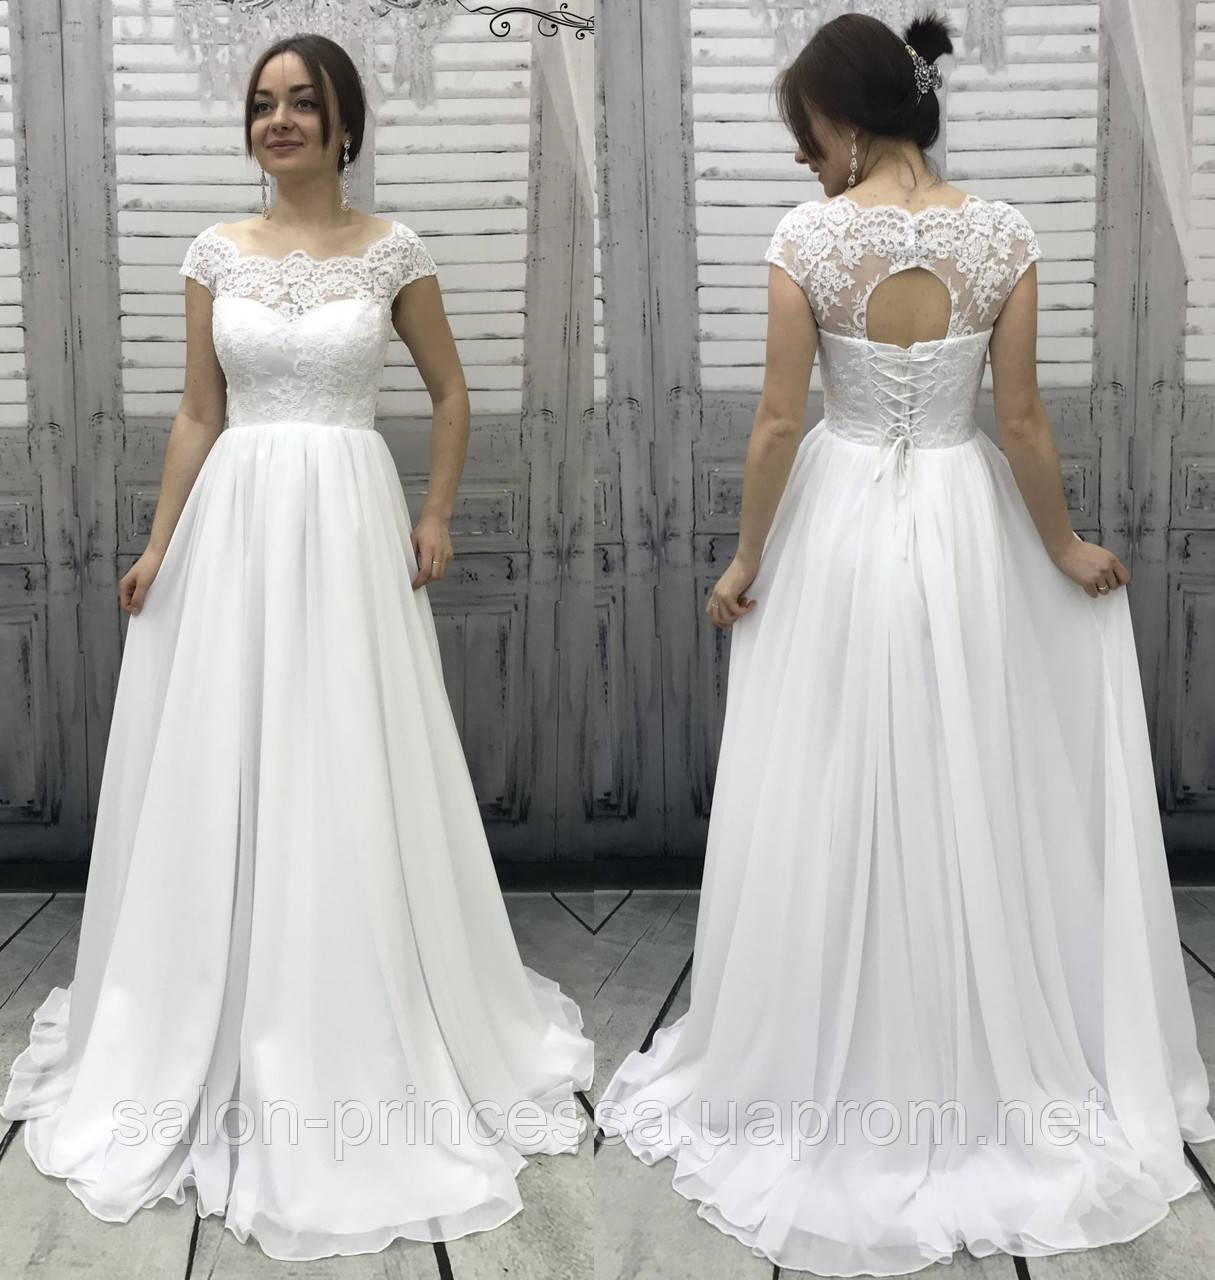 ac8e26ad2fa Свадебное платье